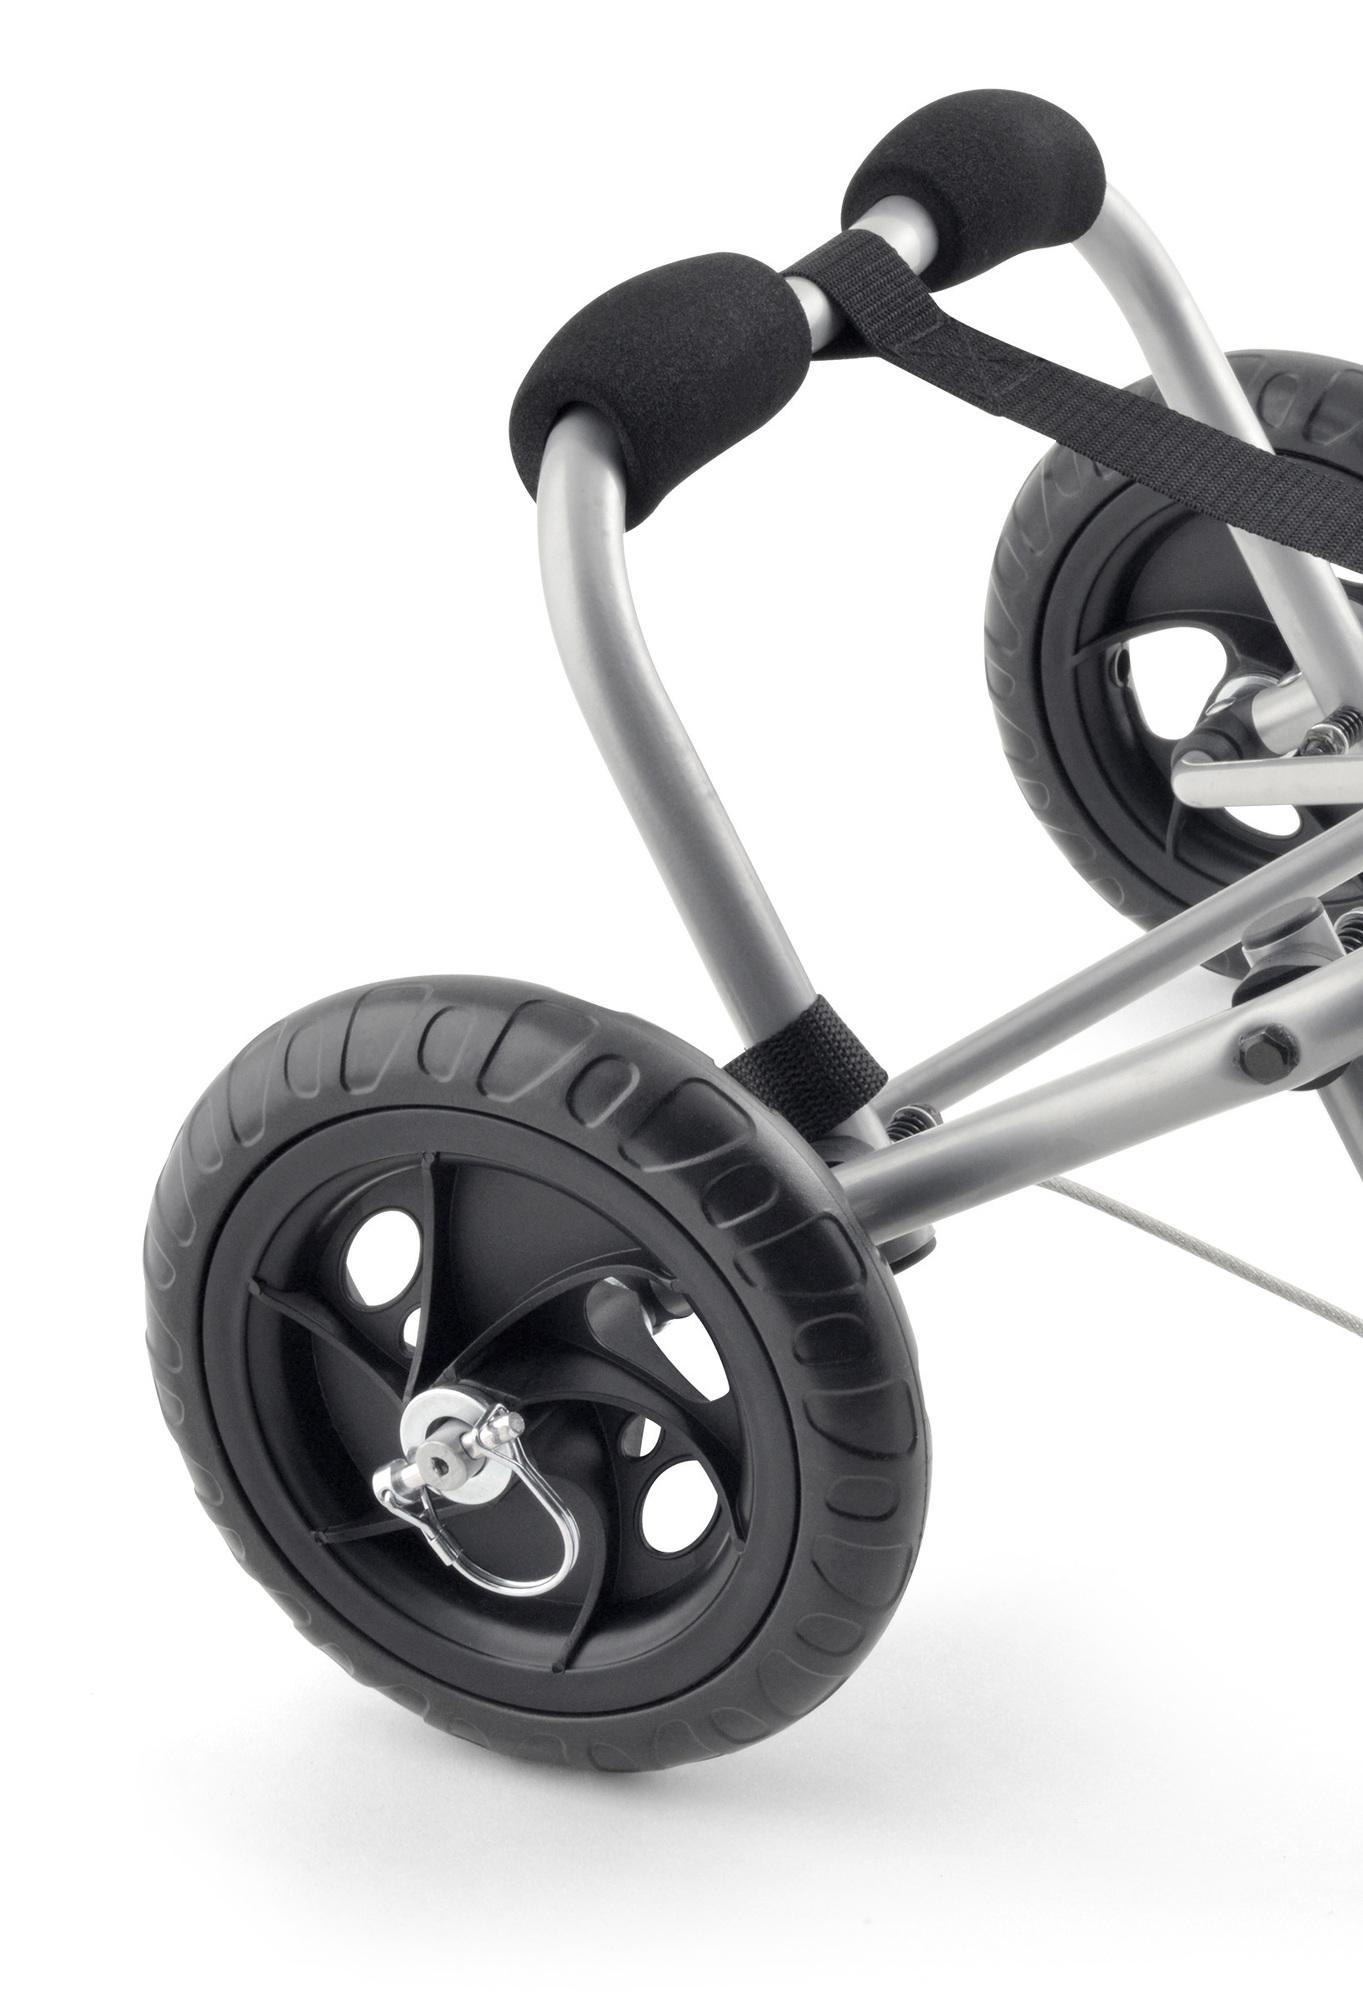 Propel Paddle SLPG40245 Ppg Mini Yak-Canoe Wheel Cart